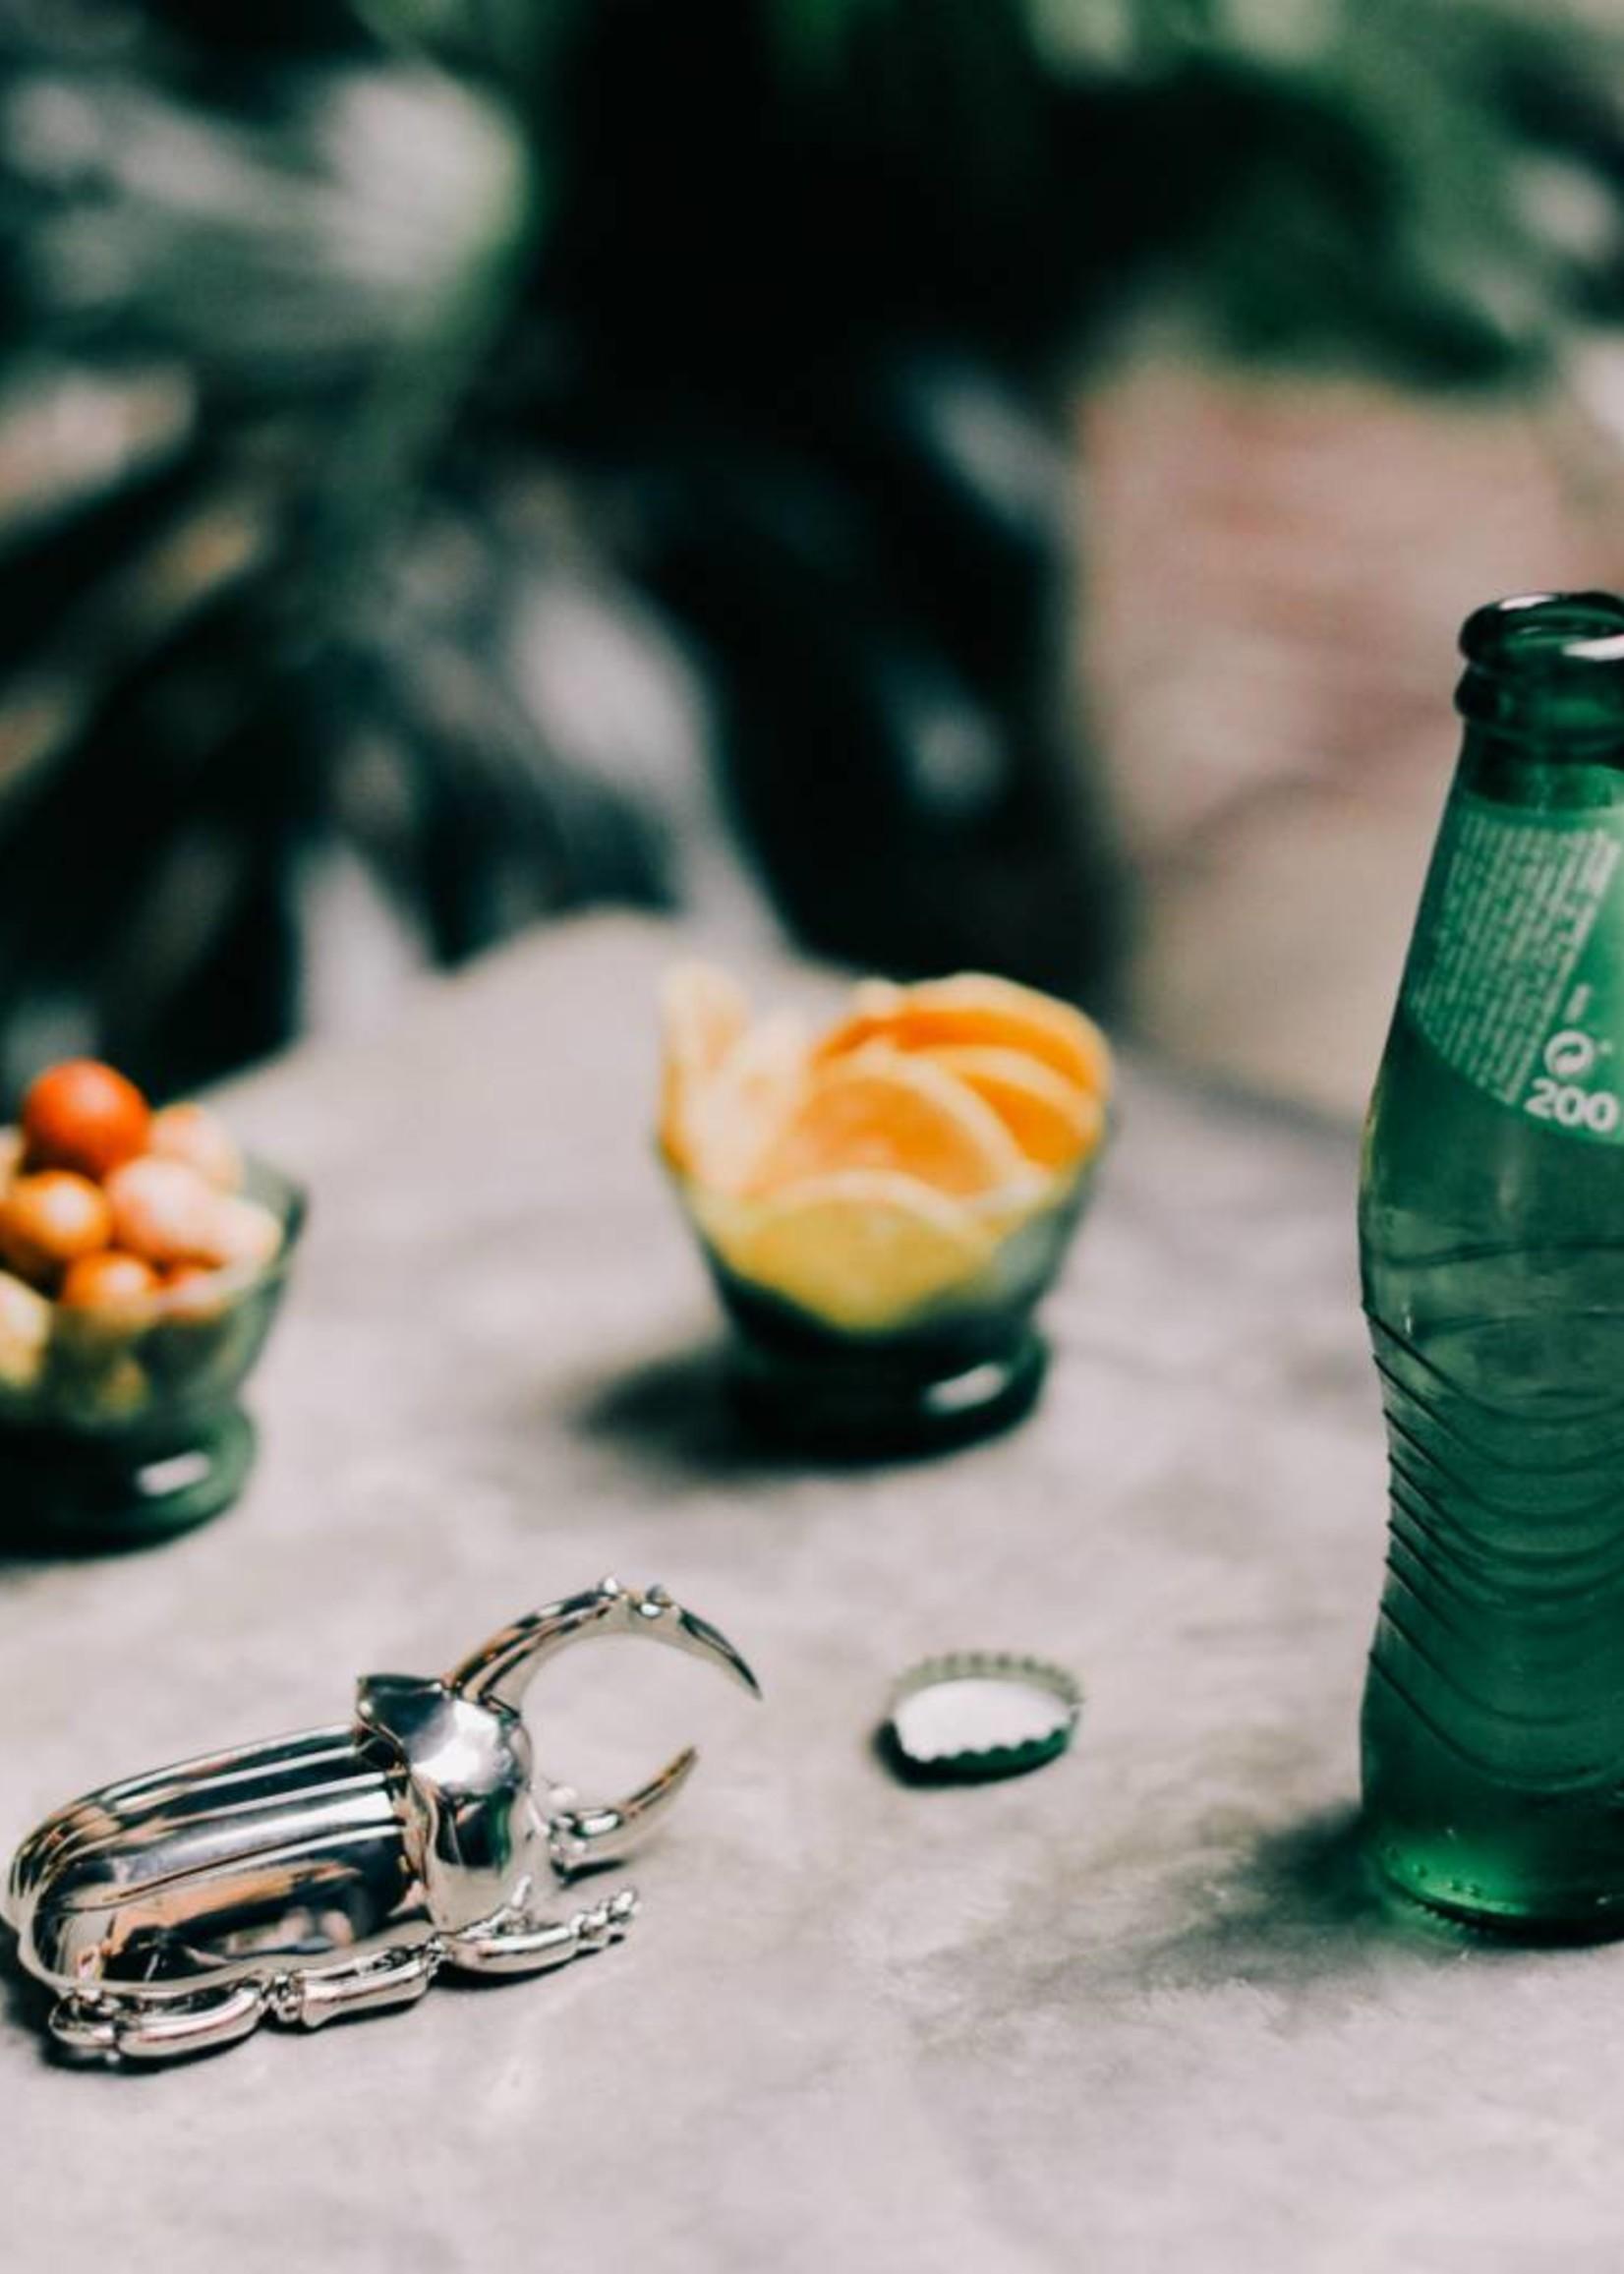 DOIY Insectum bottle opener